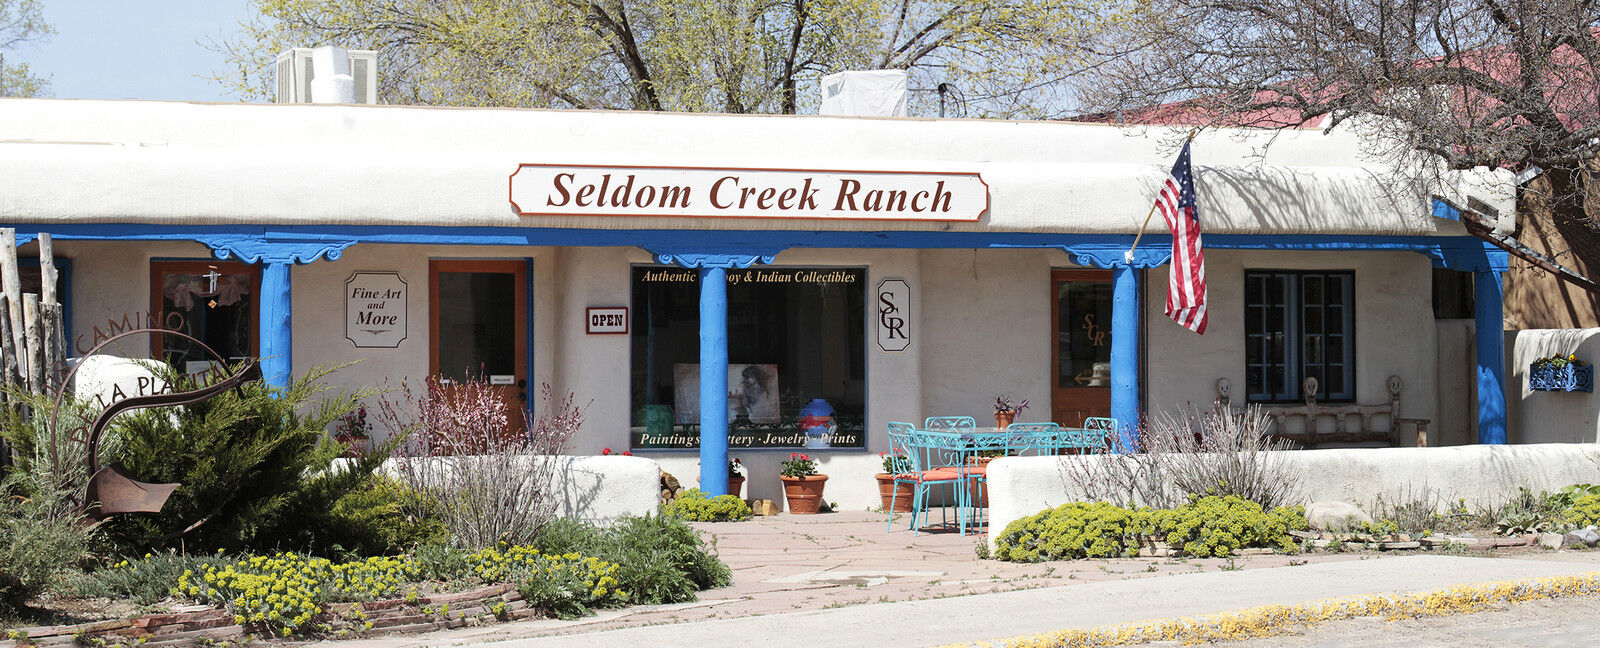 Seldom Creek Ranch